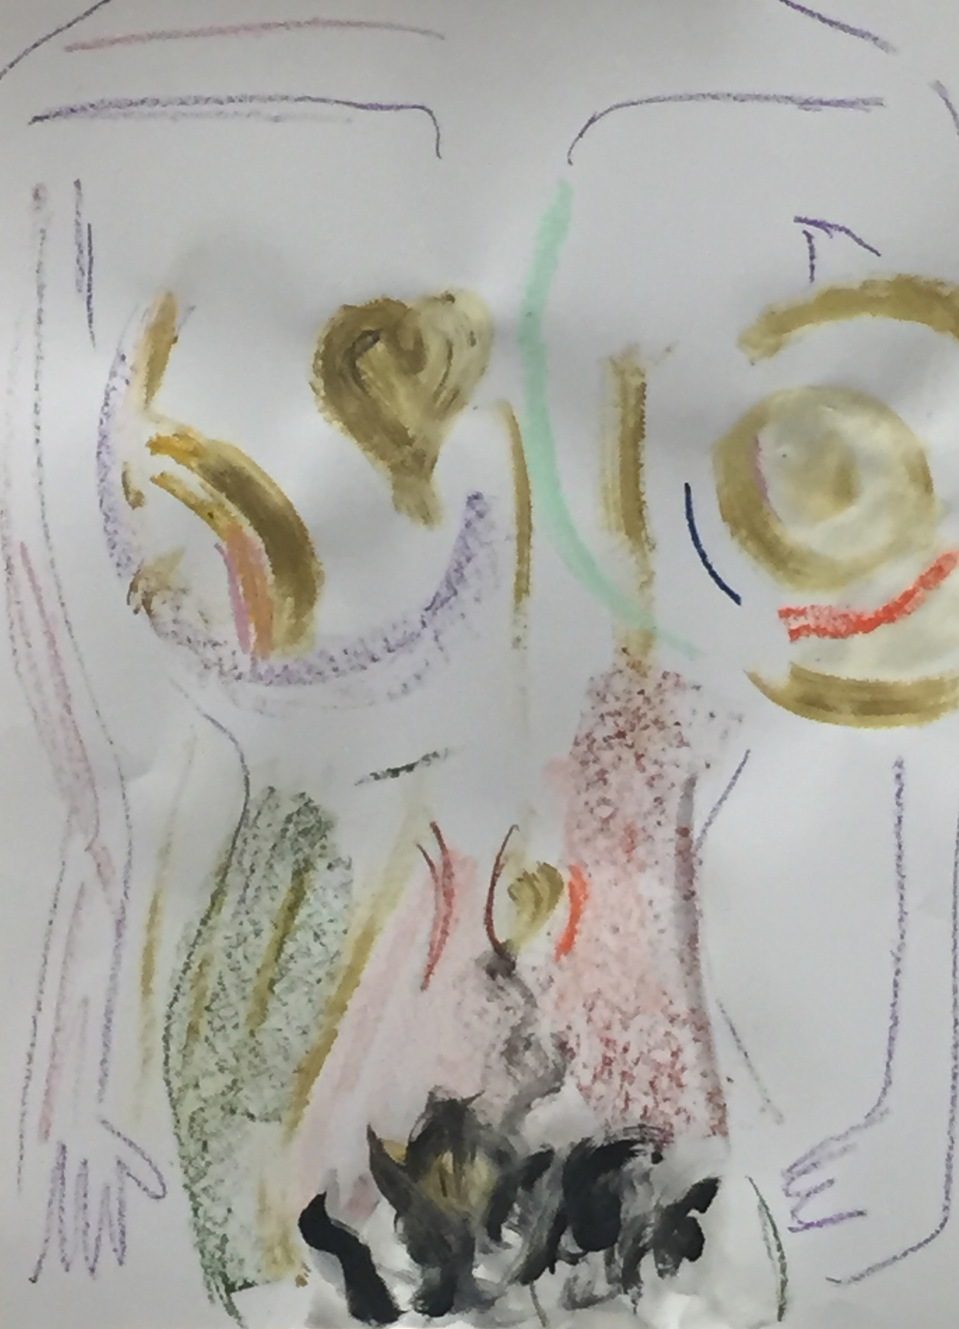 image3 (1).jpg